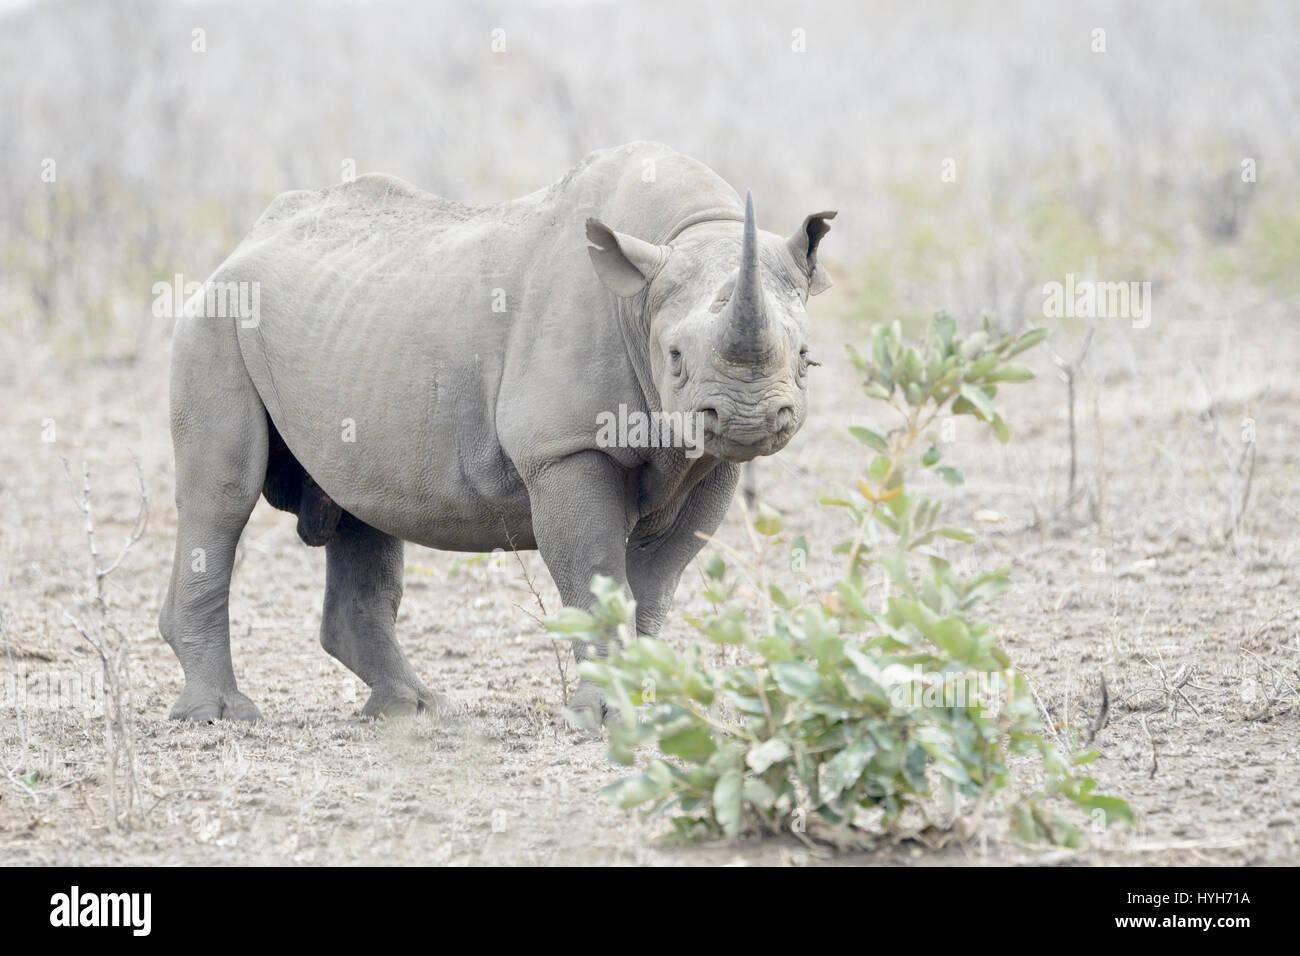 Black Rhinoceros (Diceros bicornis) standing on savannah, looking at camera, Kruger National Park, South Africa - Stock Image